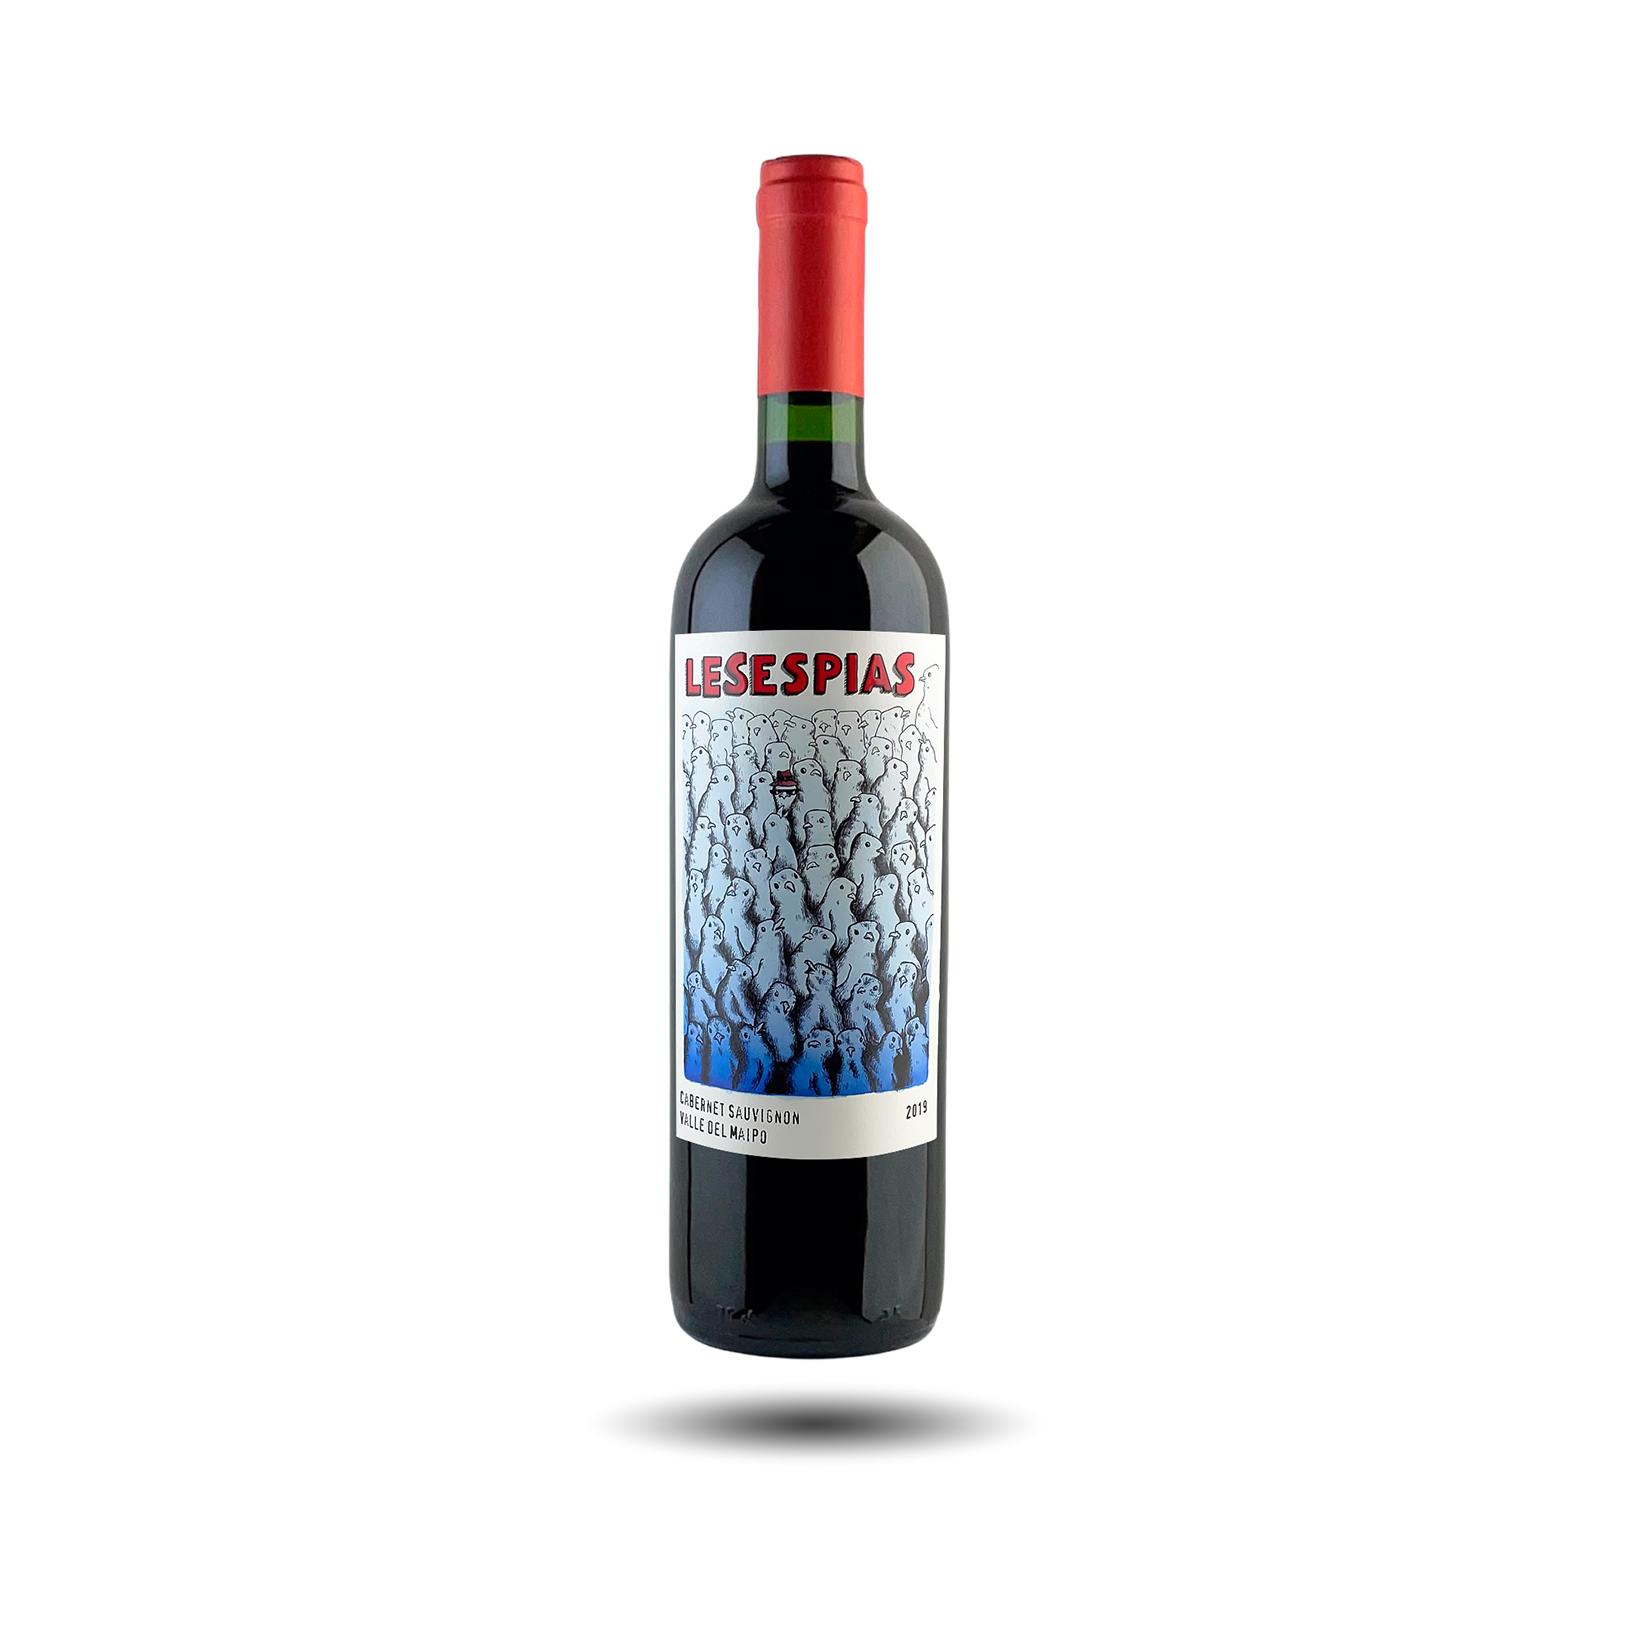 Moretta Wines - Les Espias, Cabernet Sauvignon, 2019